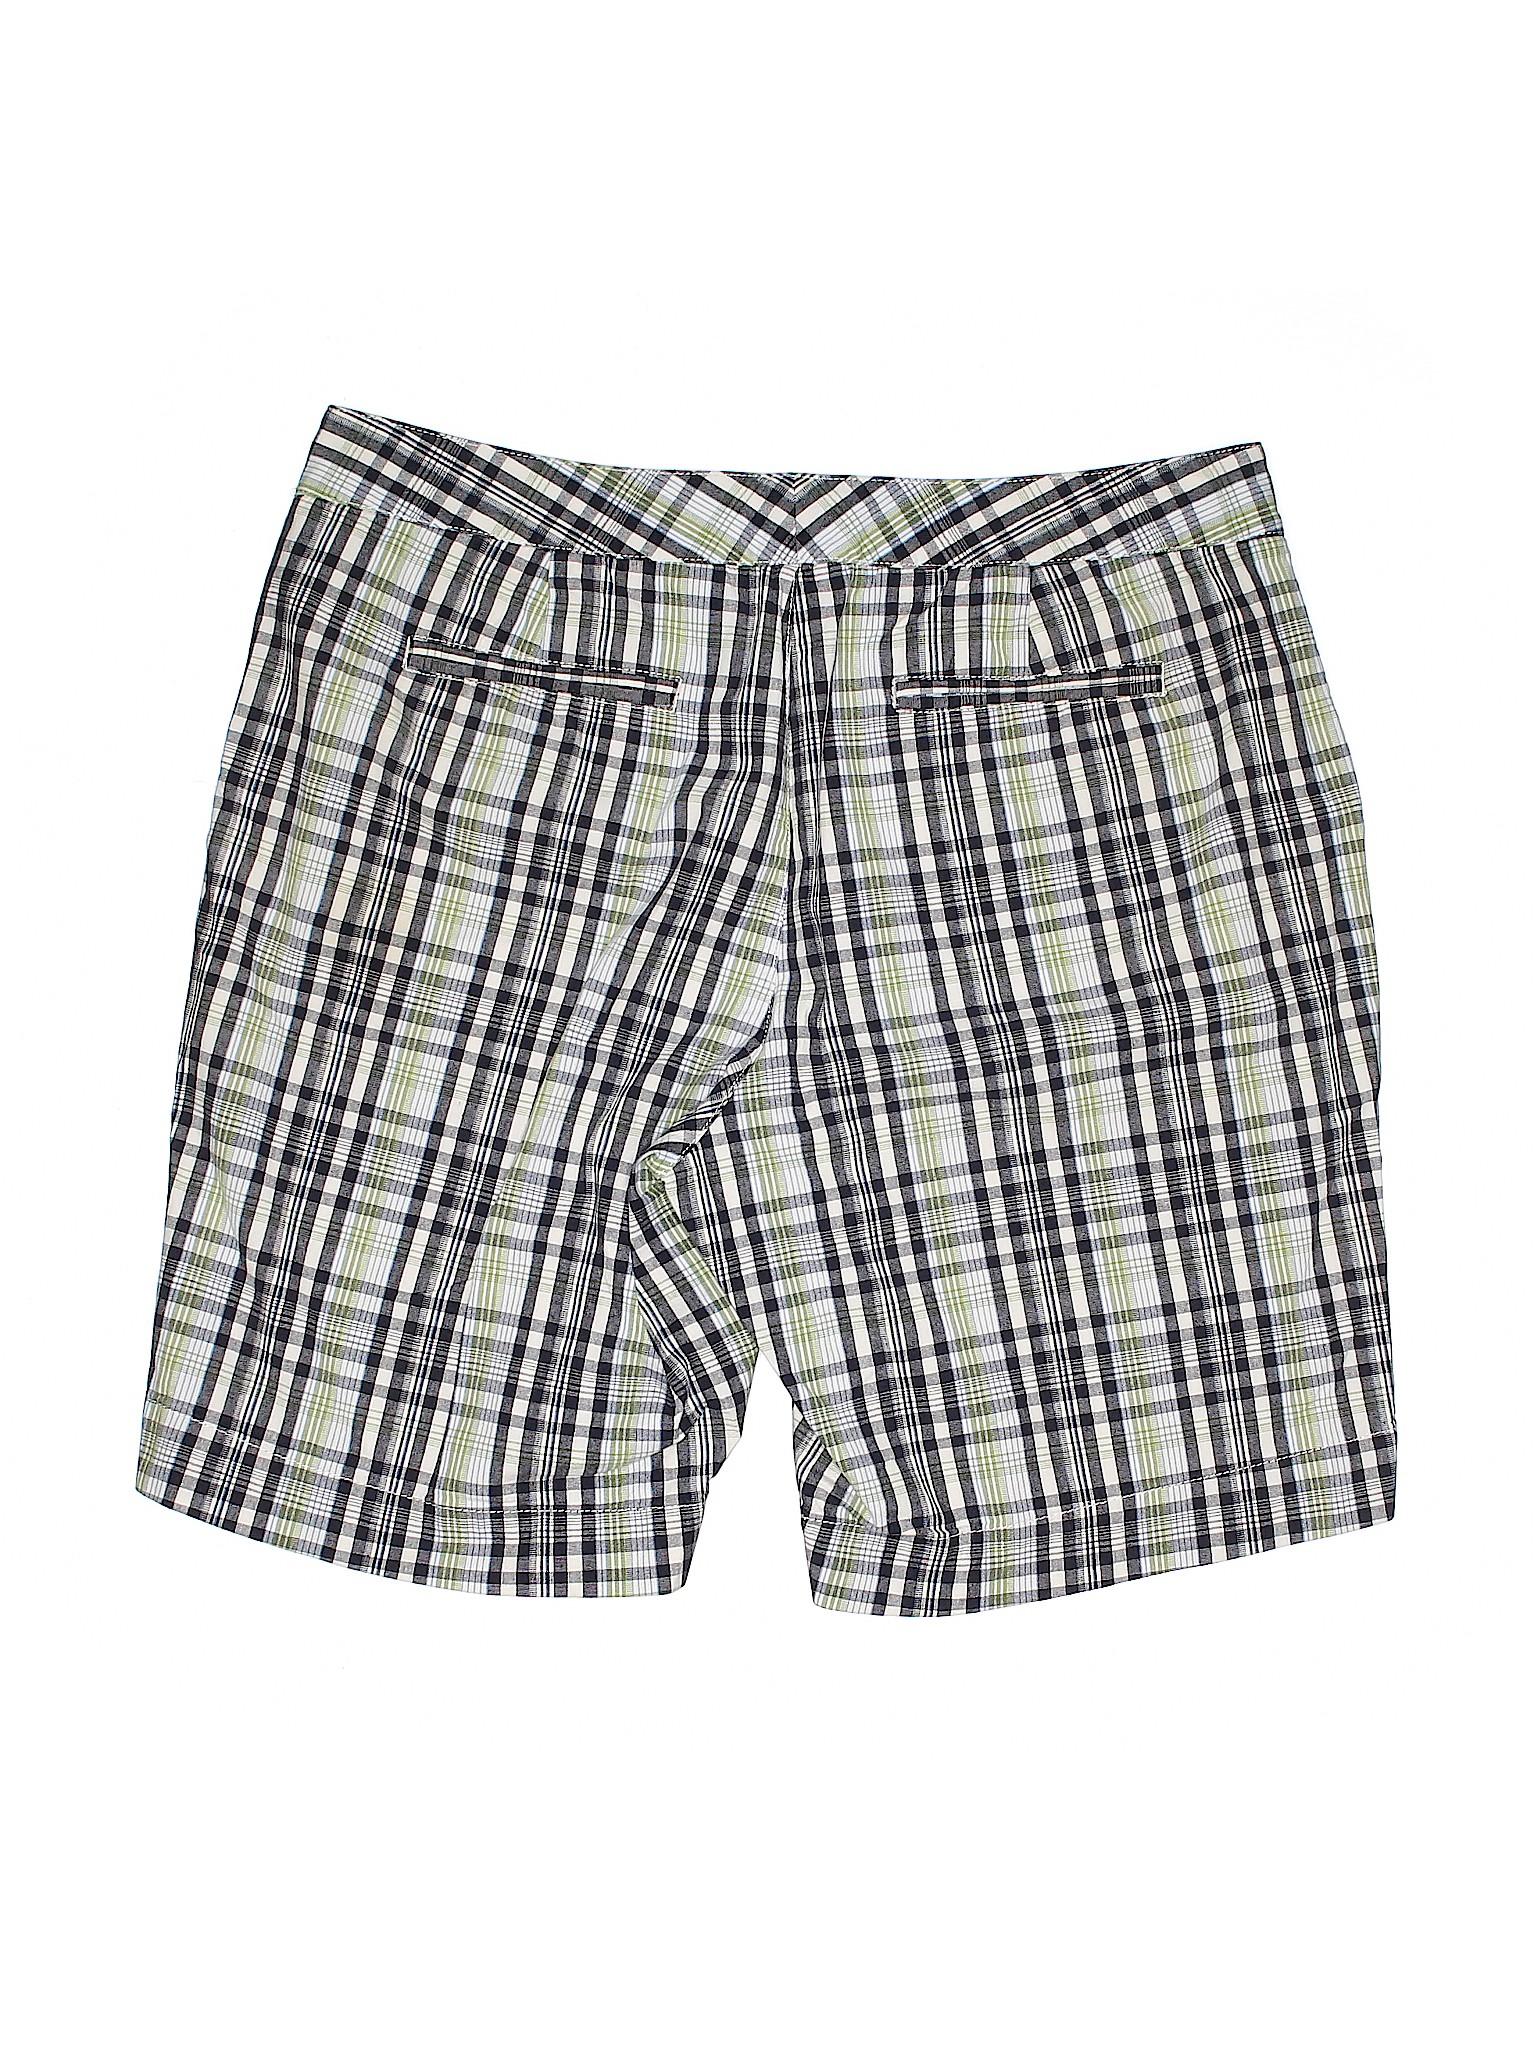 Boutique Boutique Dockers Khaki Boutique Dockers Shorts Khaki Shorts Dockers zFFXq6a